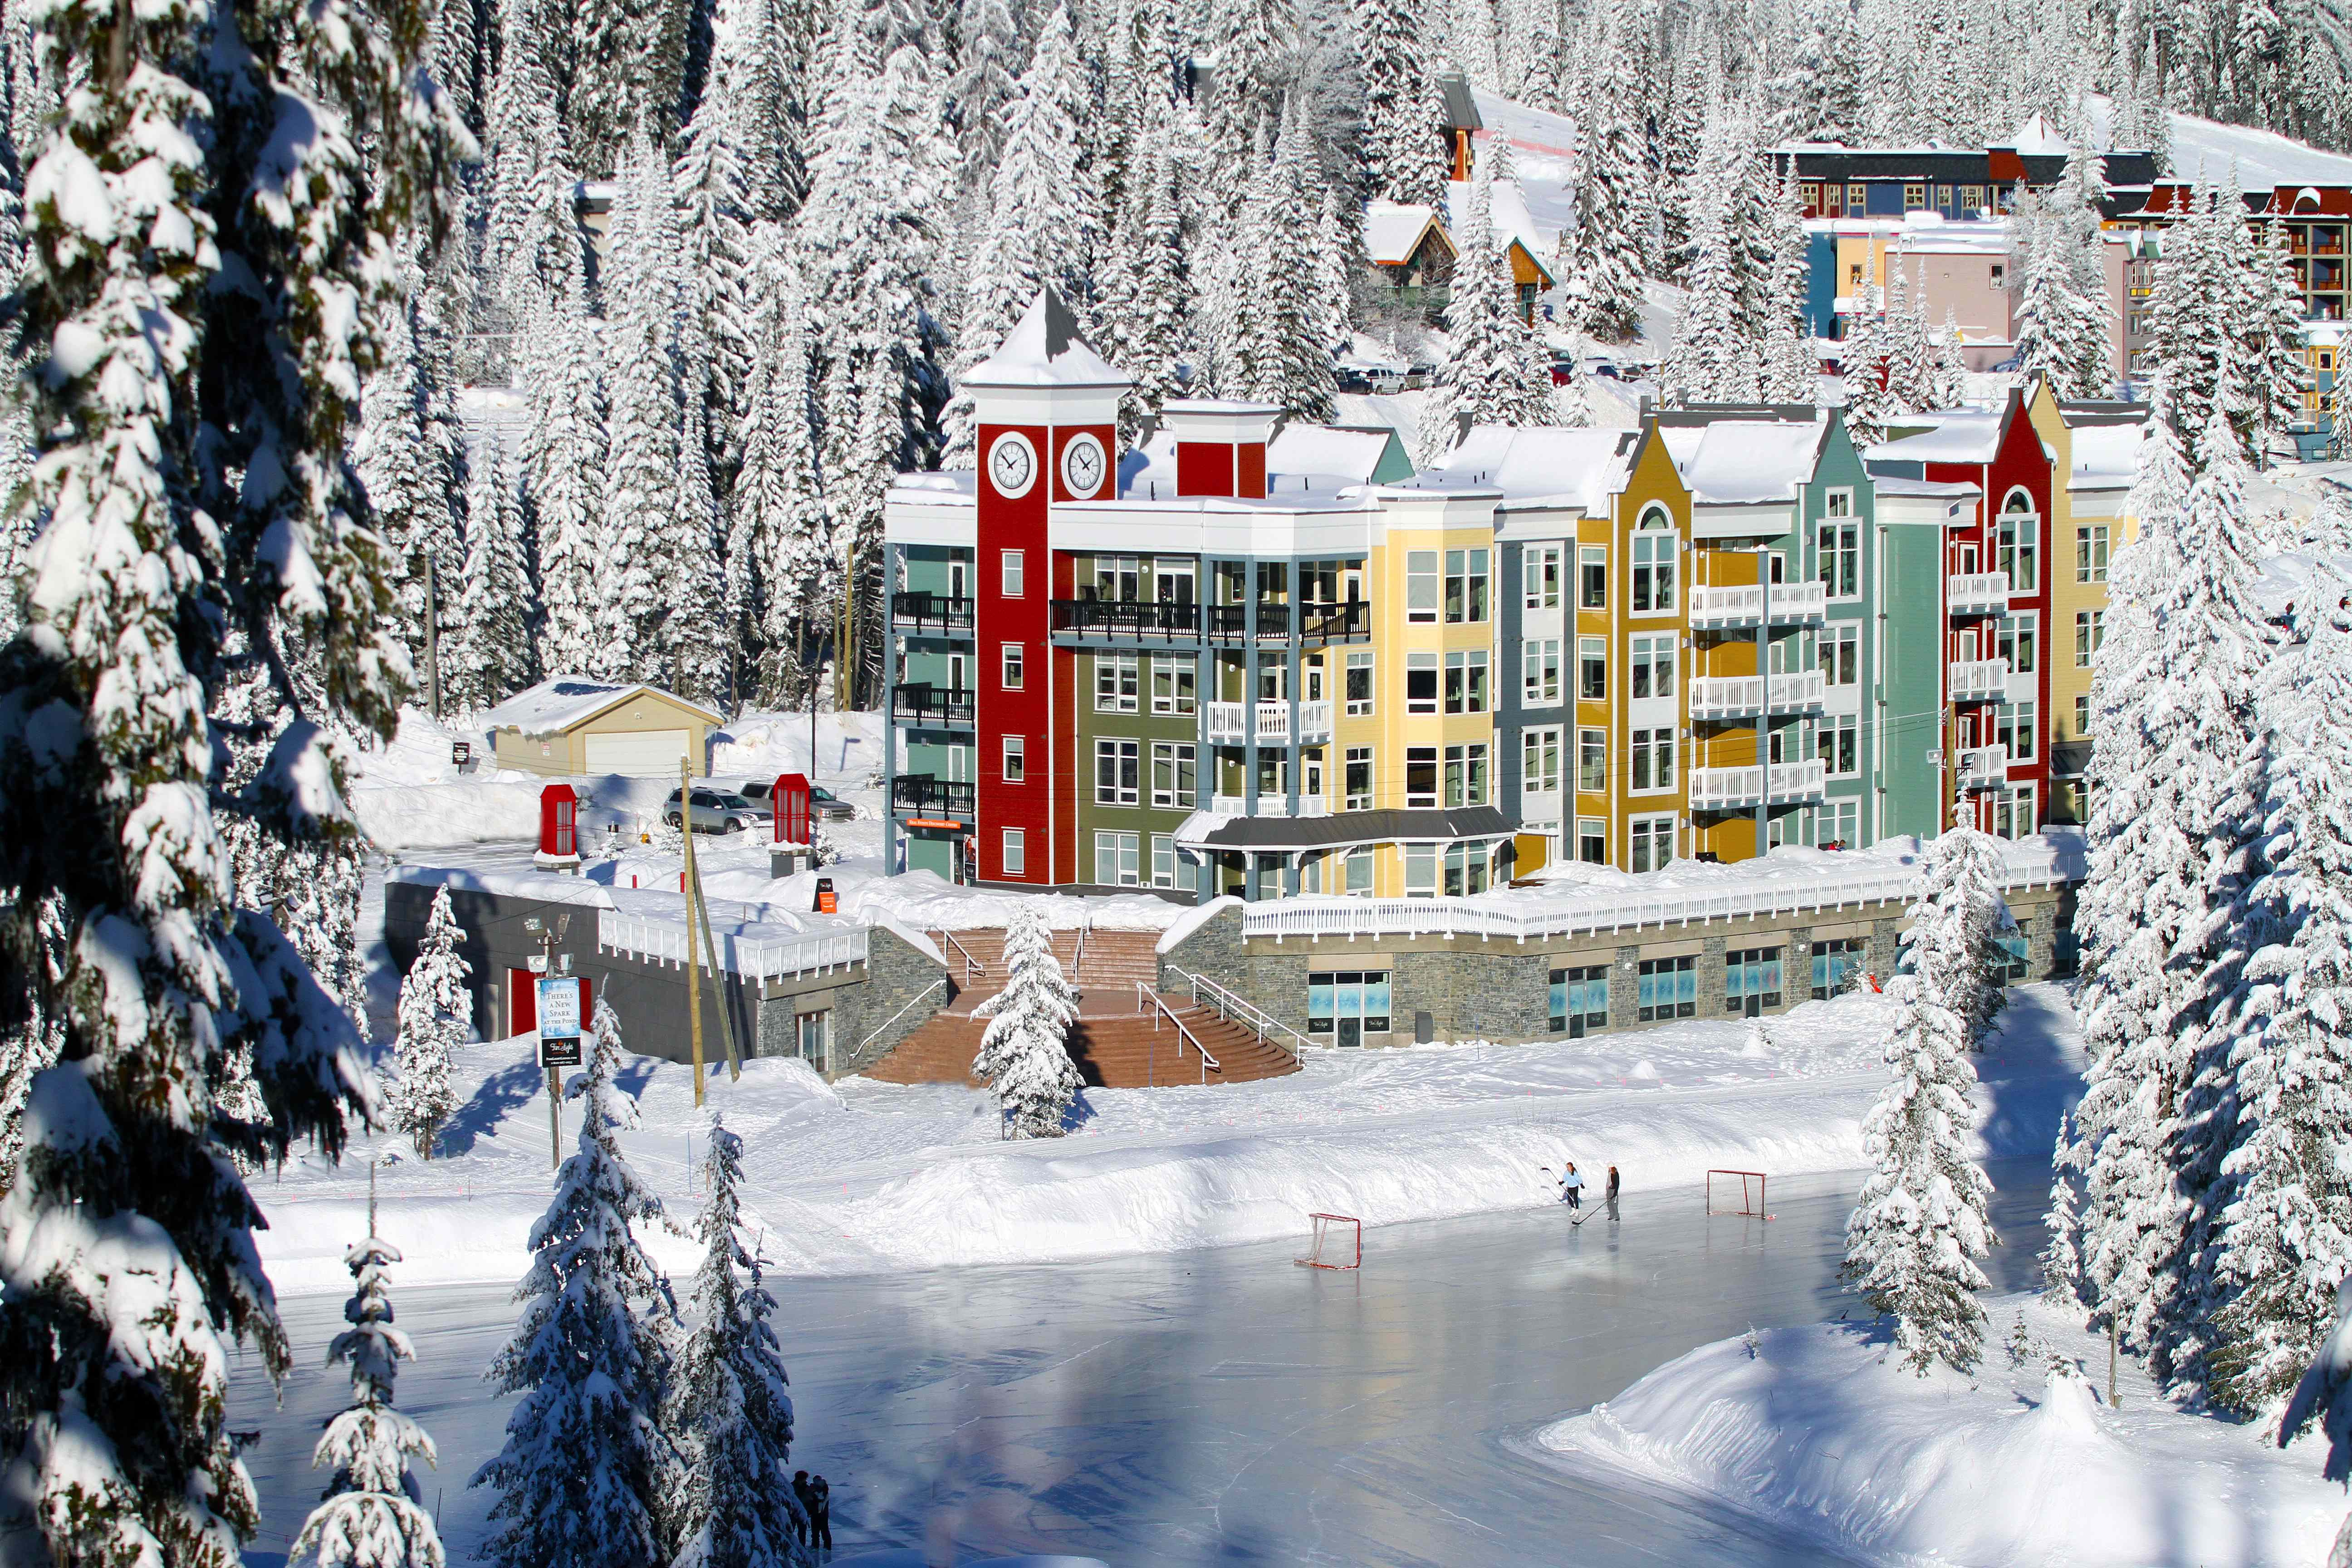 Canada ski resort with casino showboat casino adress